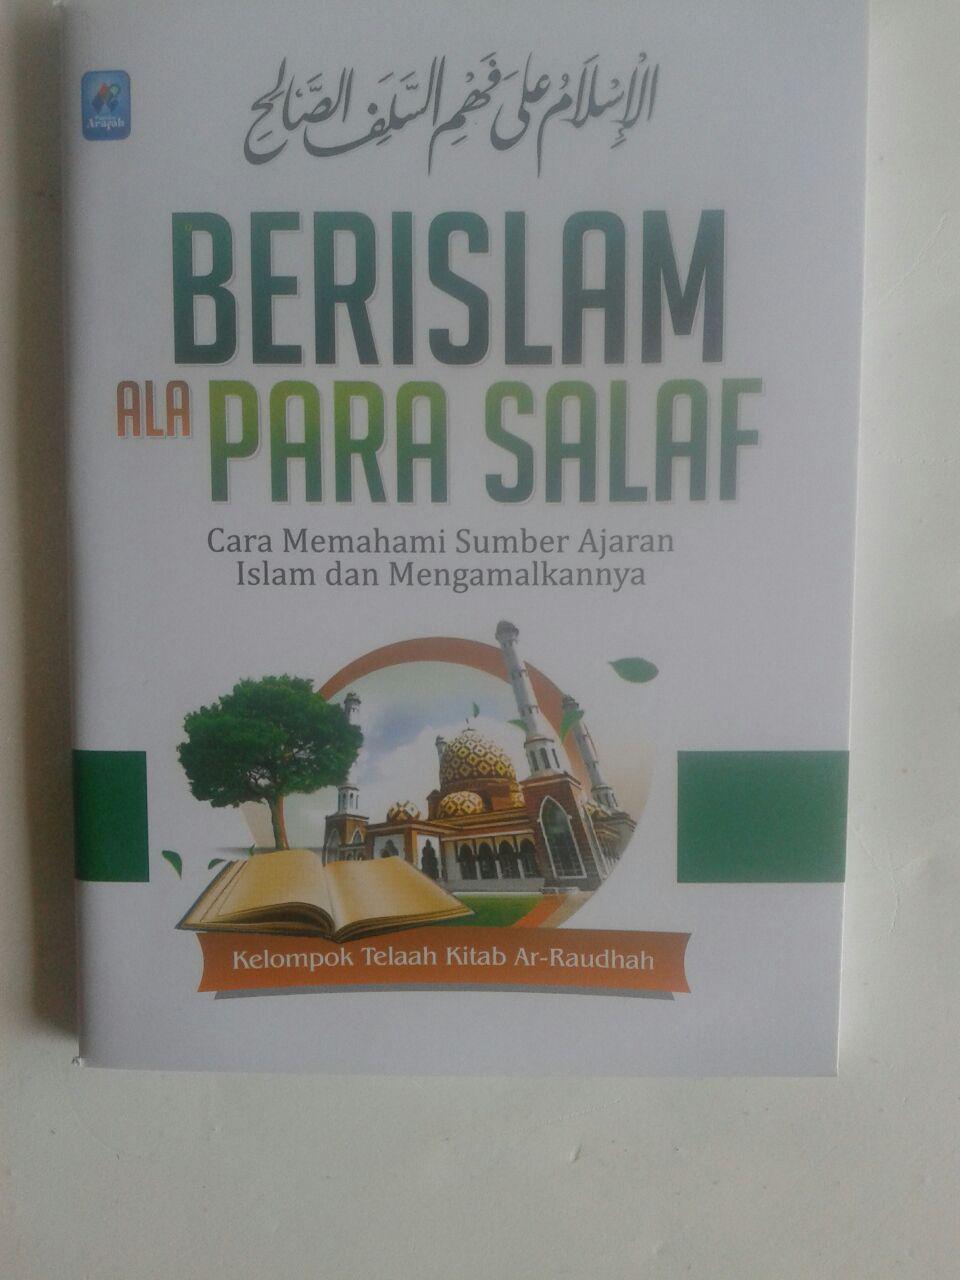 Buku Saku Berislam Ala Para Salaf Cara Memahami Sumber Islam cover 2